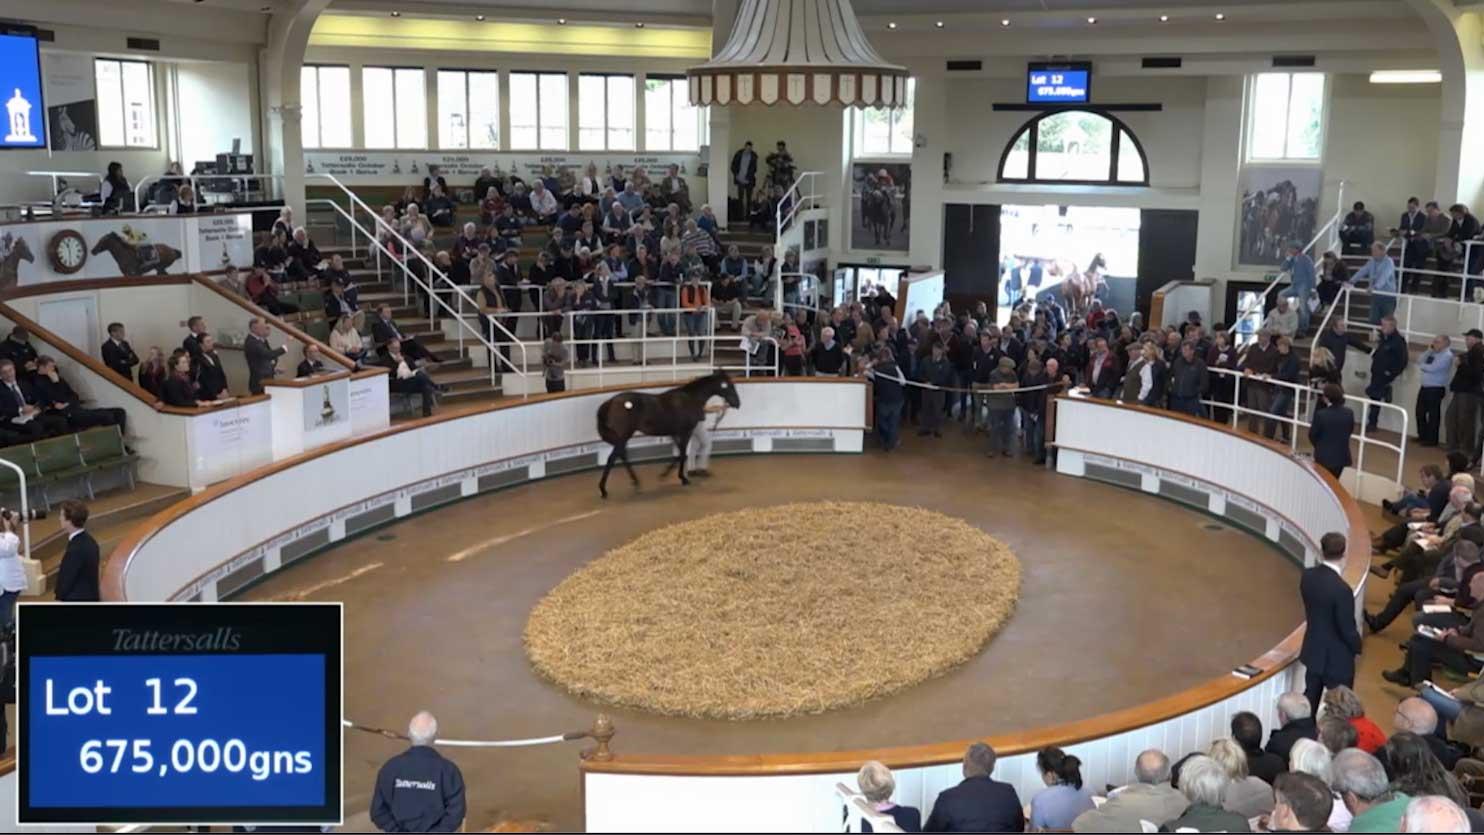 auction webcast company to stream horse parade newmarket film live facebook 360 vr